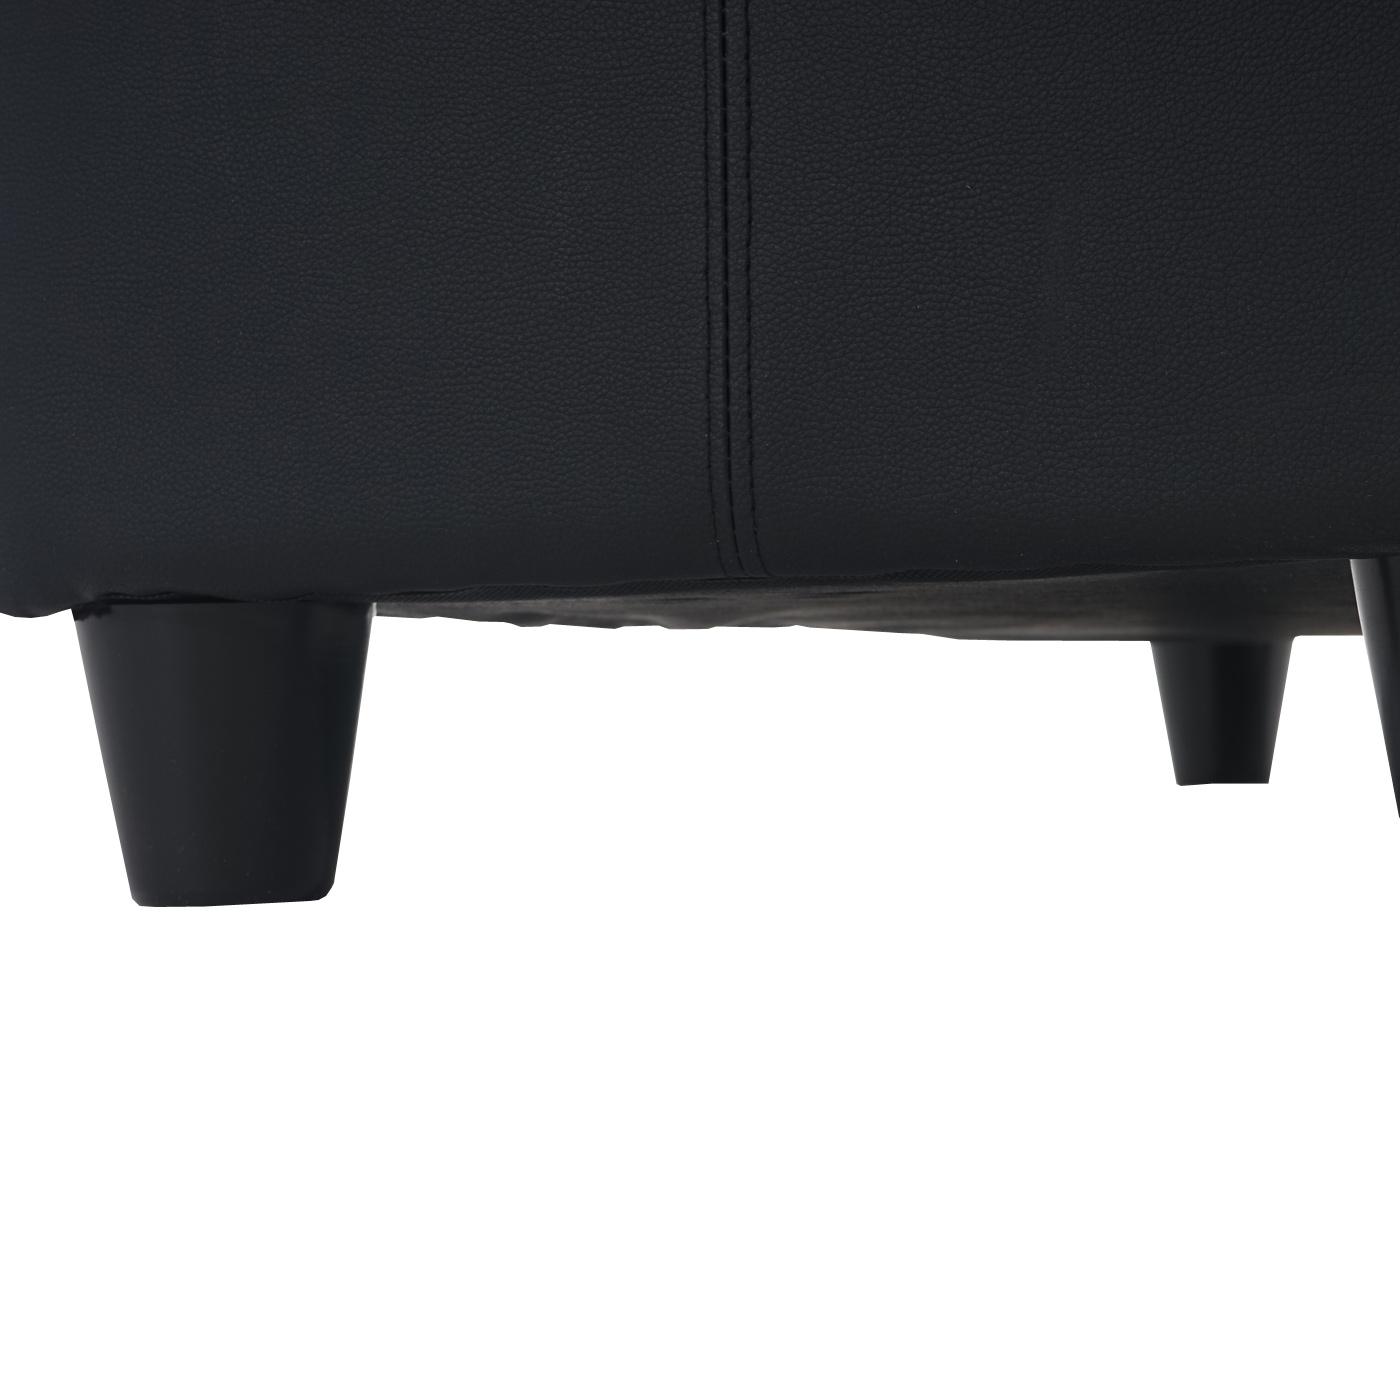 Sitzbank Kriens: Detailbild Füße